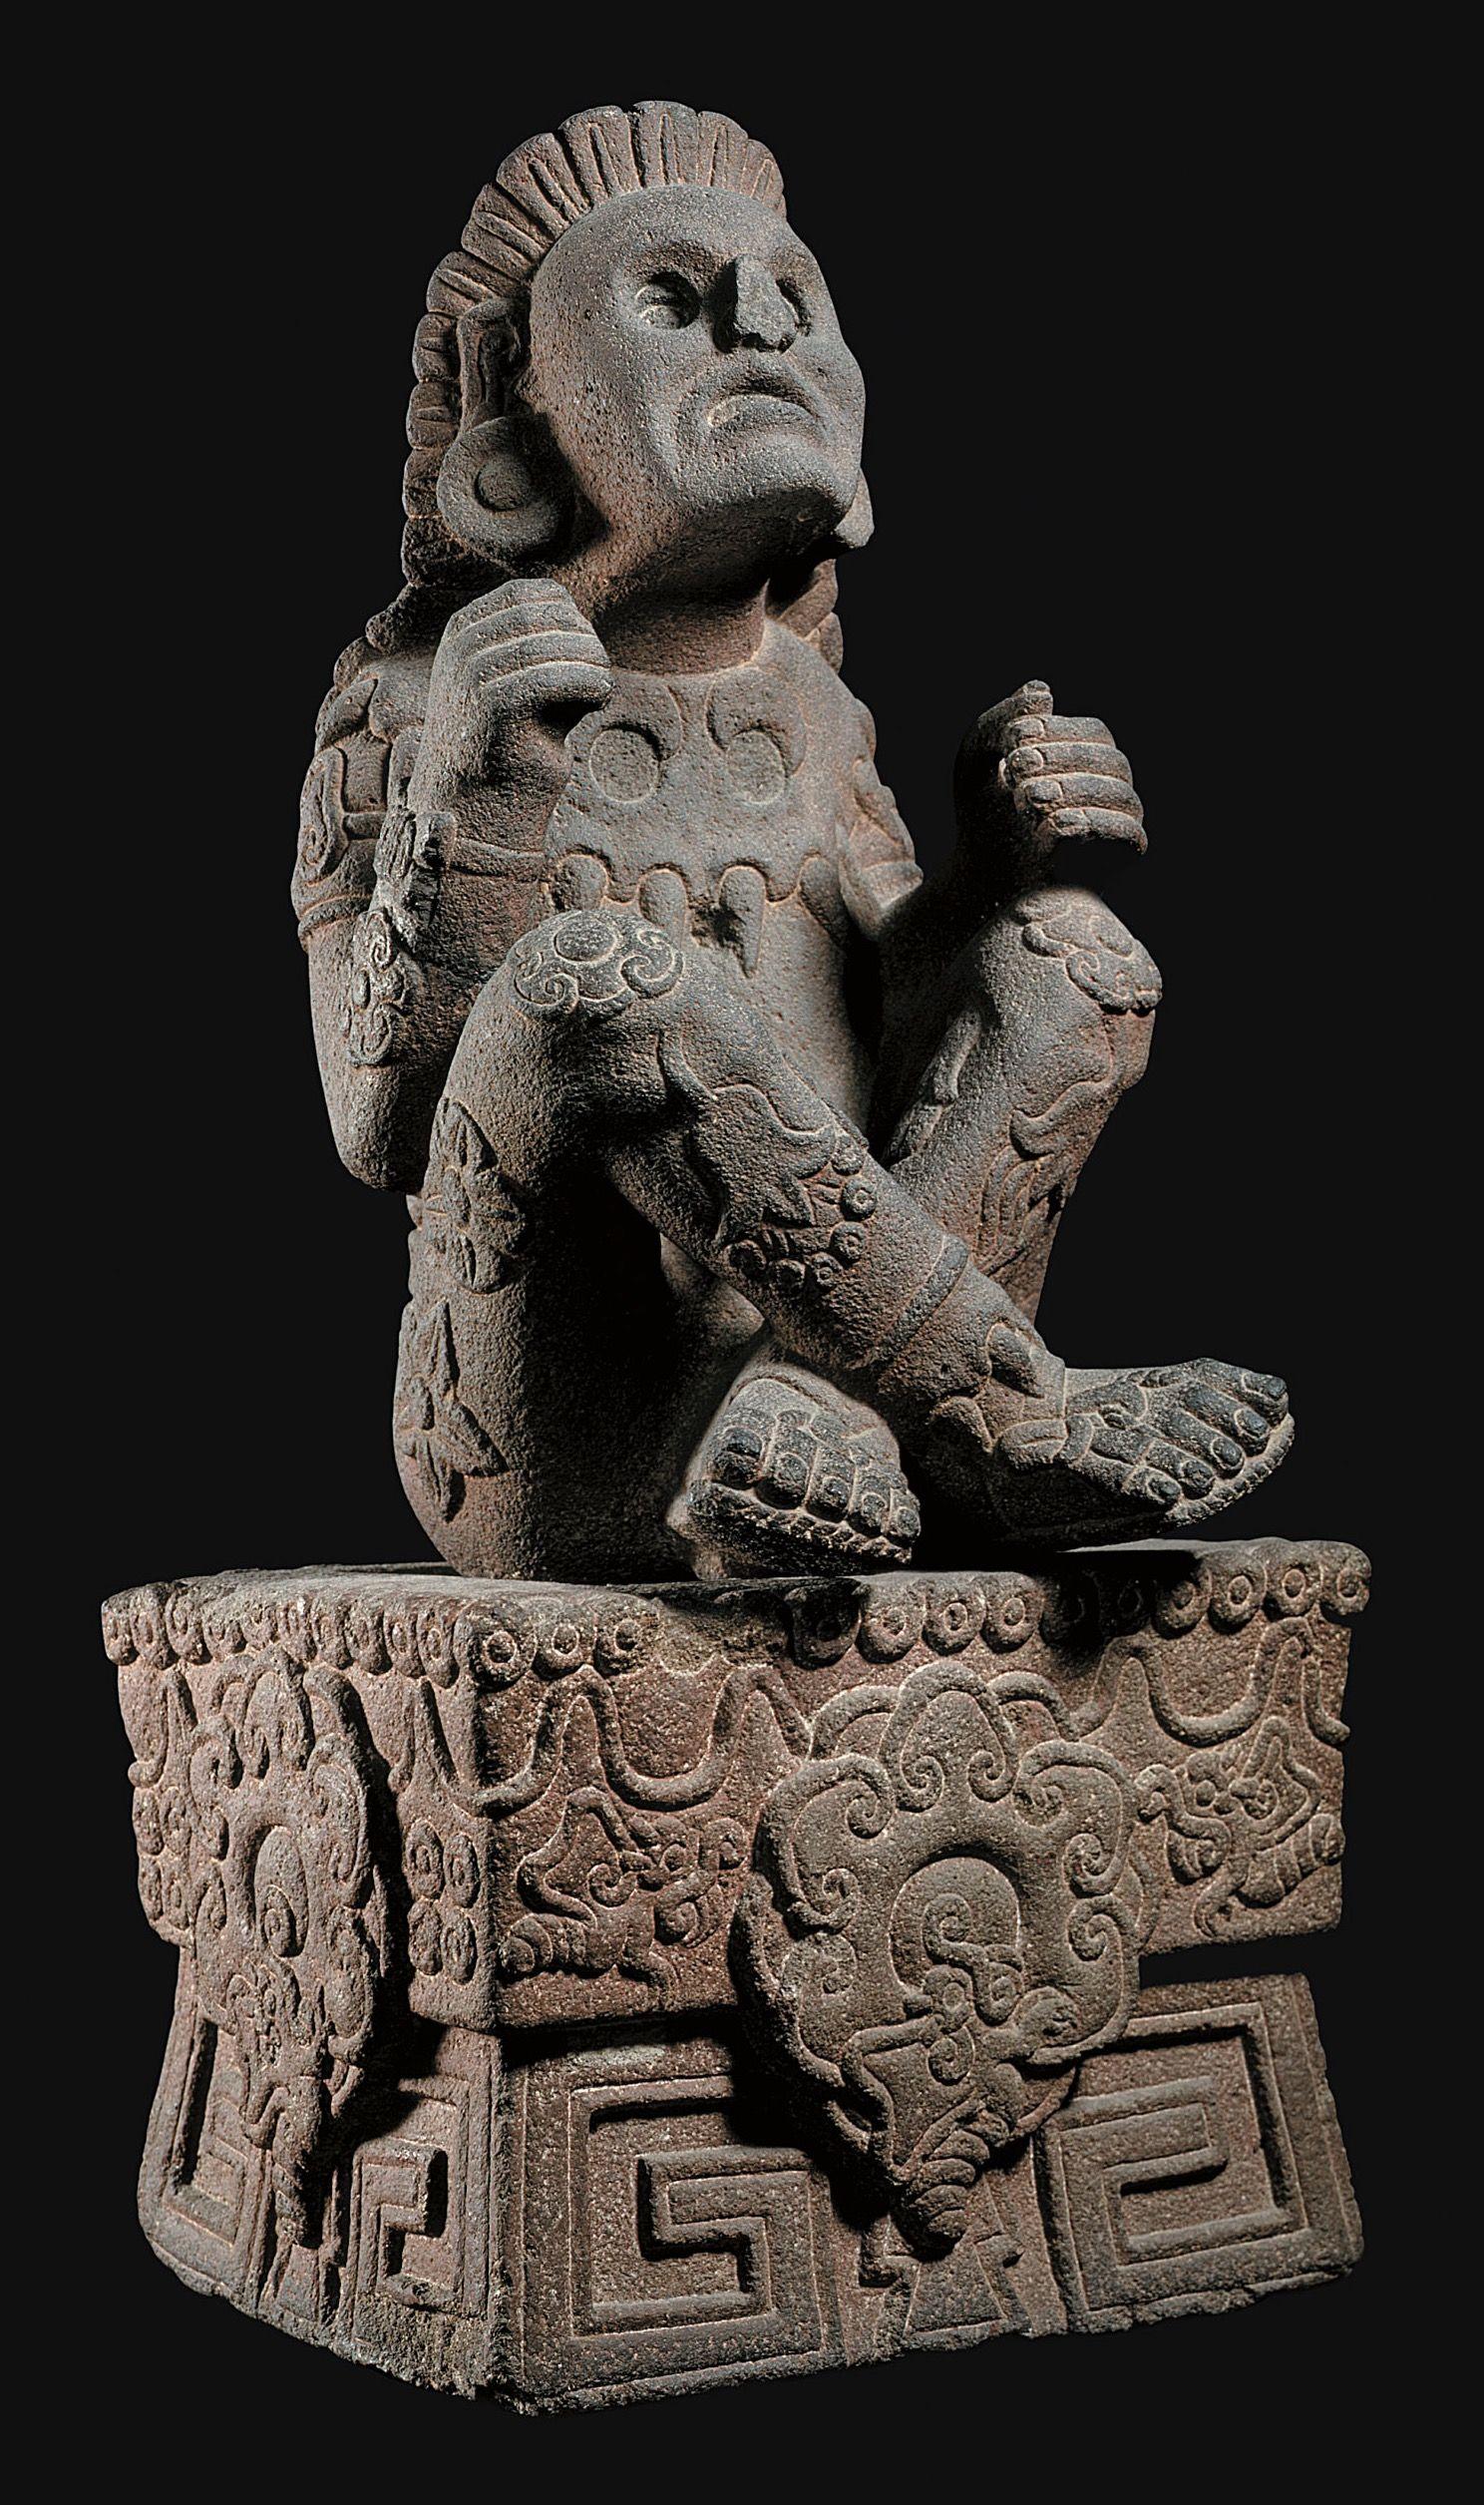 Xochipilli Aztec god of flowers, music, art. Arts of